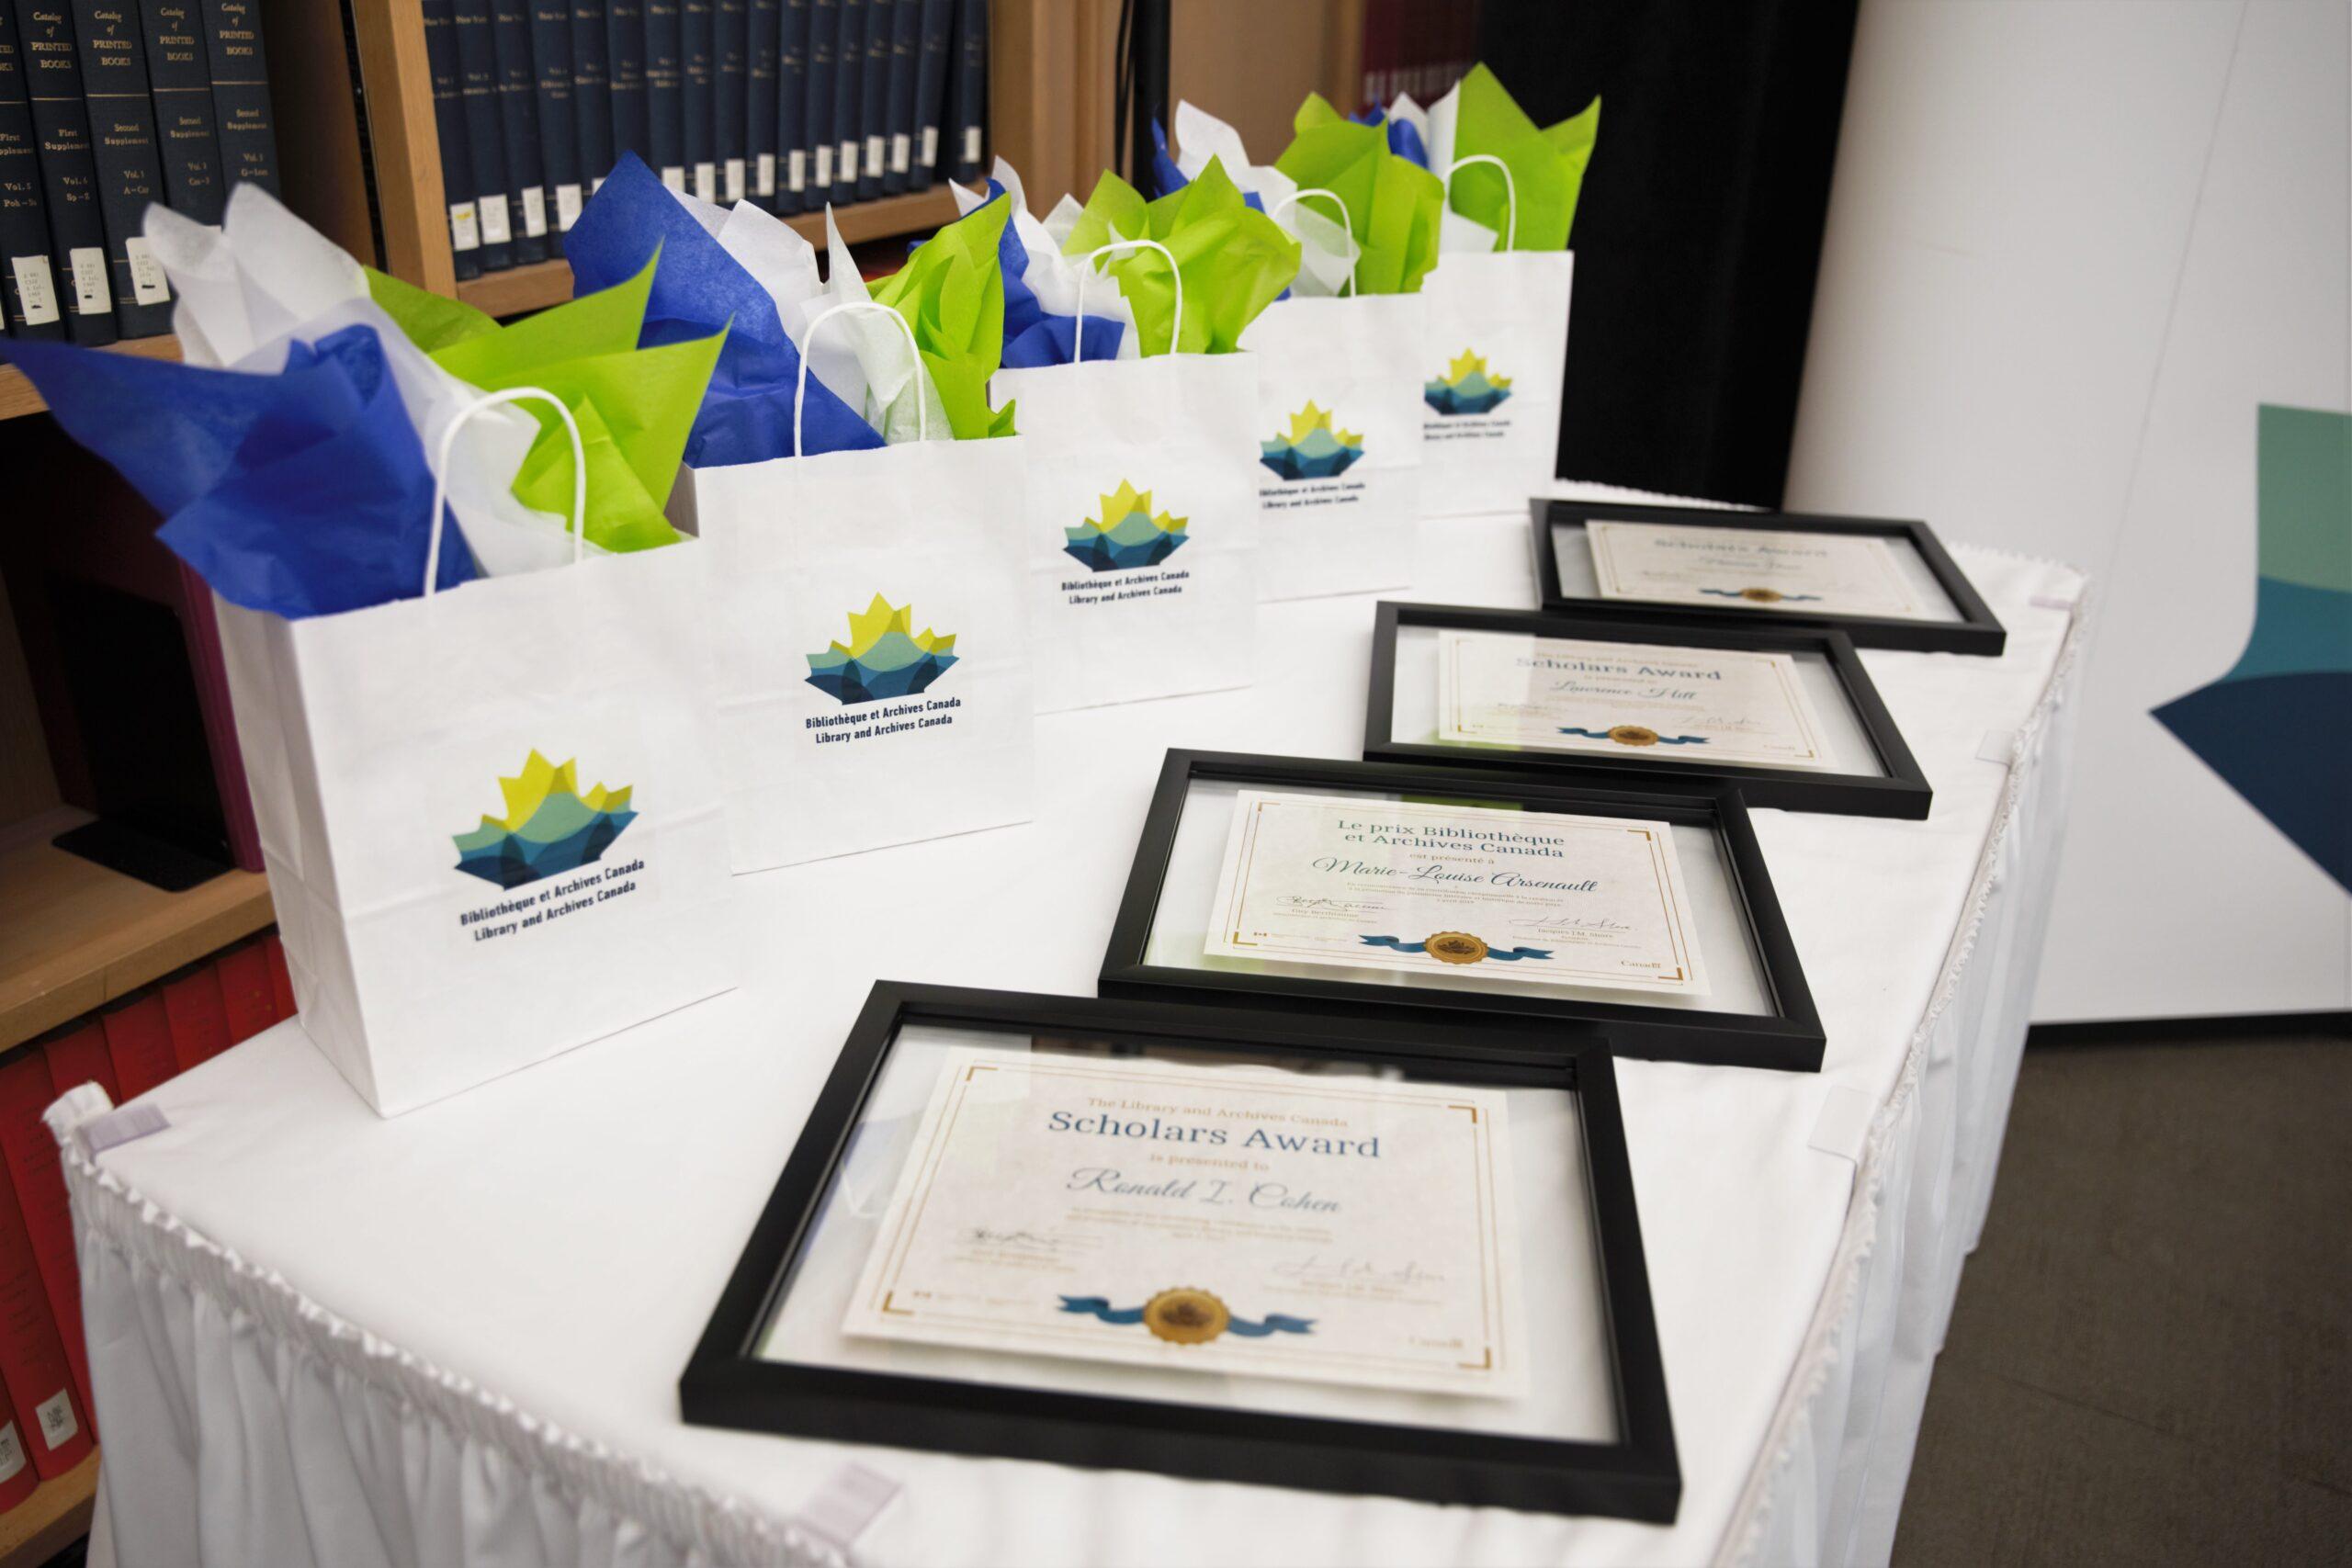 2019 LAC Scholar Awards certificates